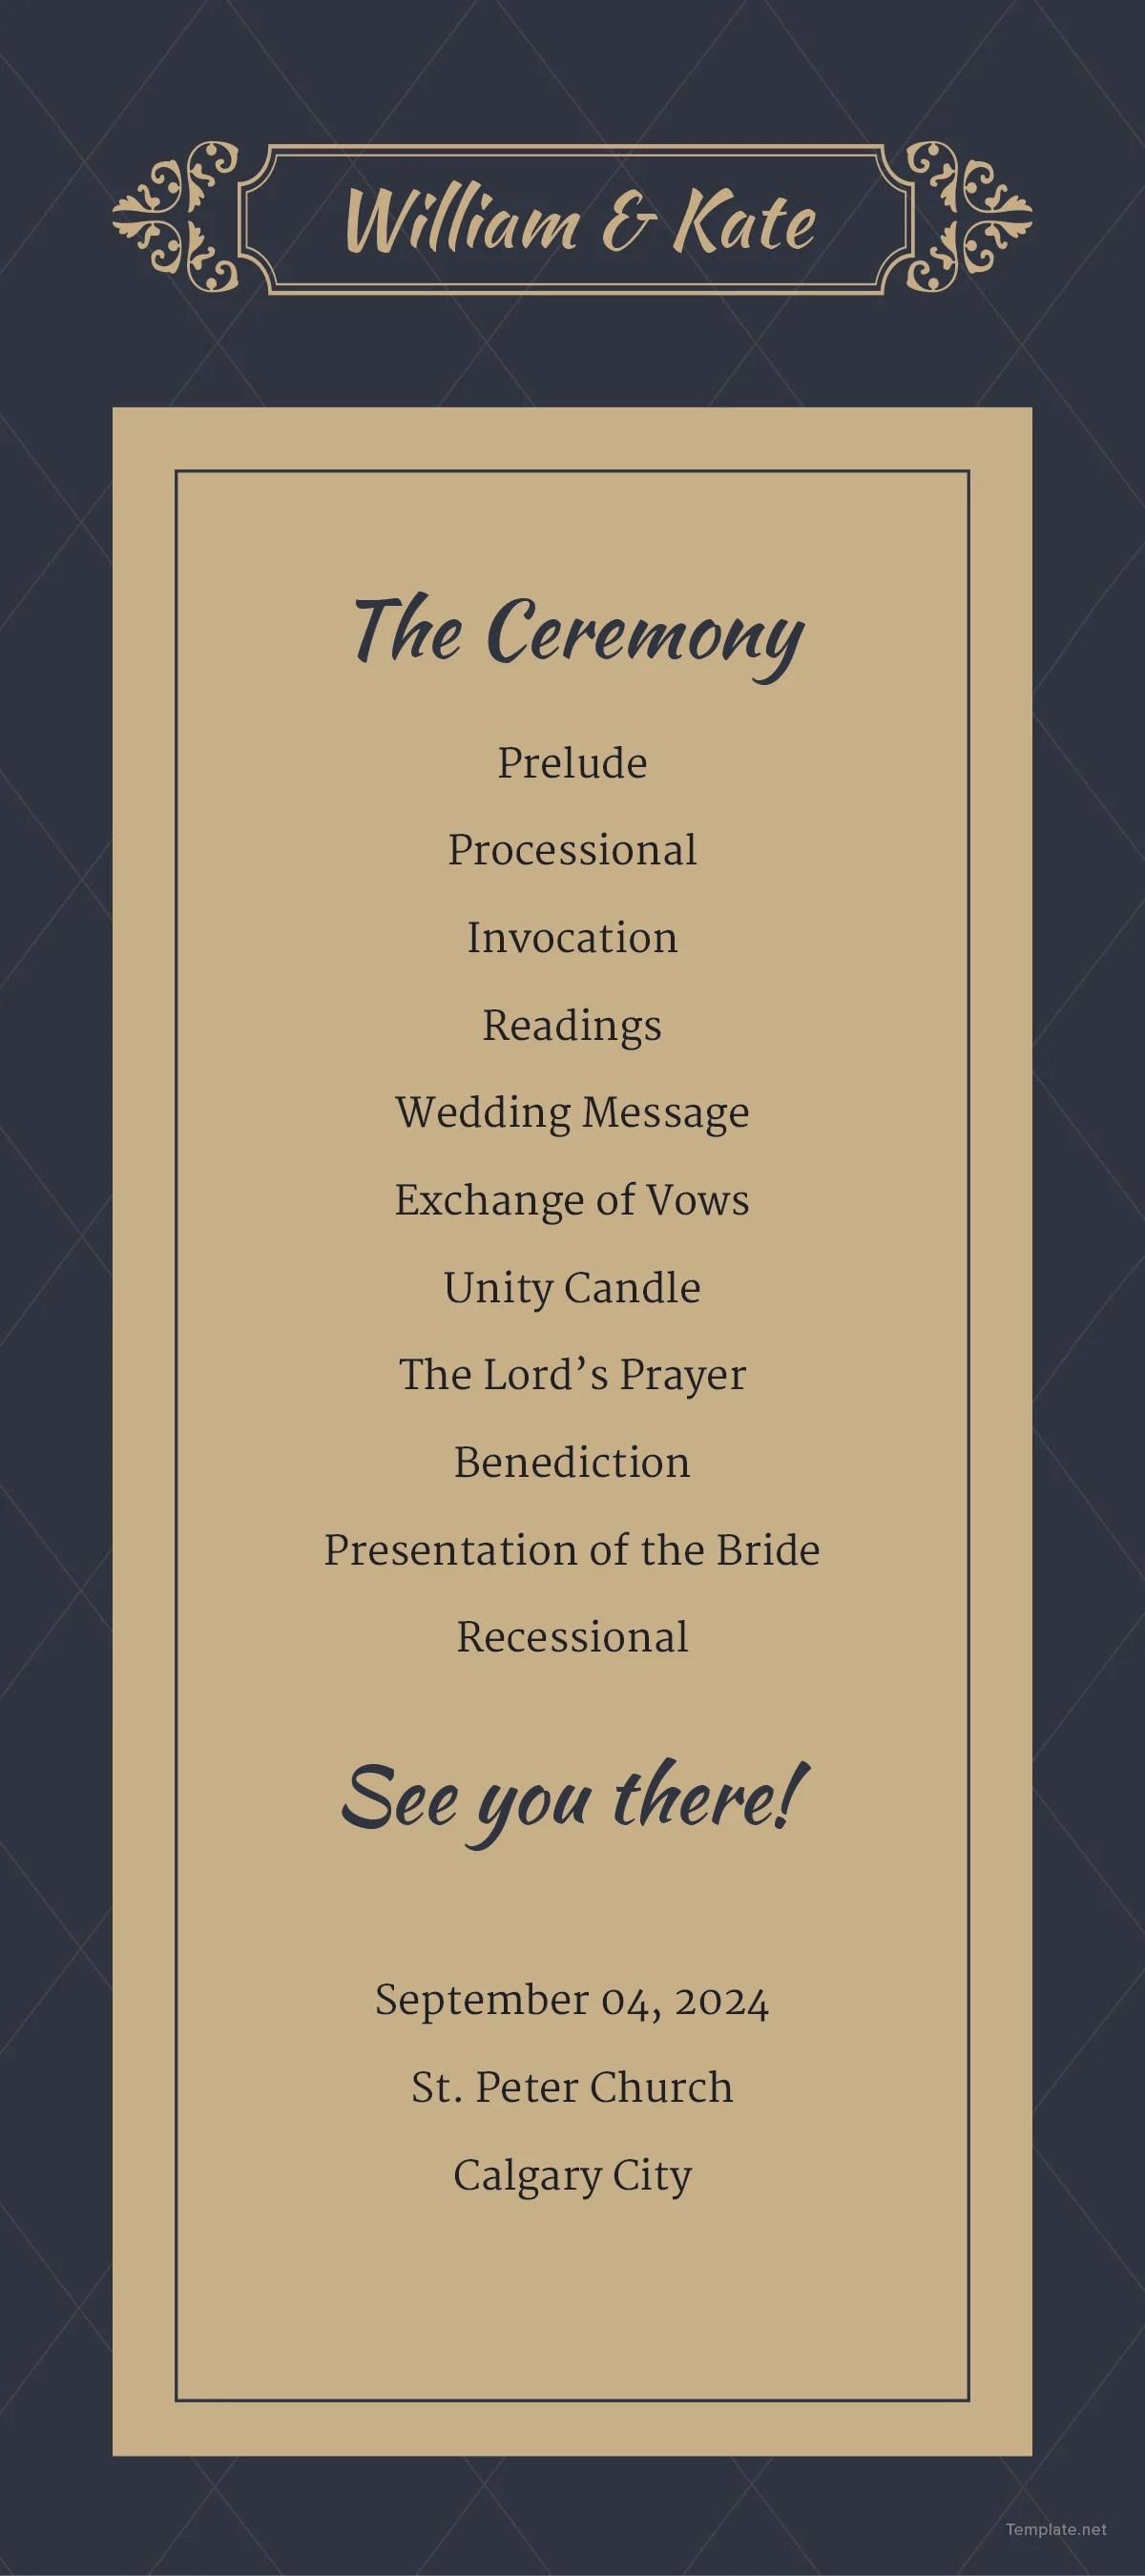 Traditional Wedding Program Template In Adobe Photoshop Illustrator Microsoft Word Publisher